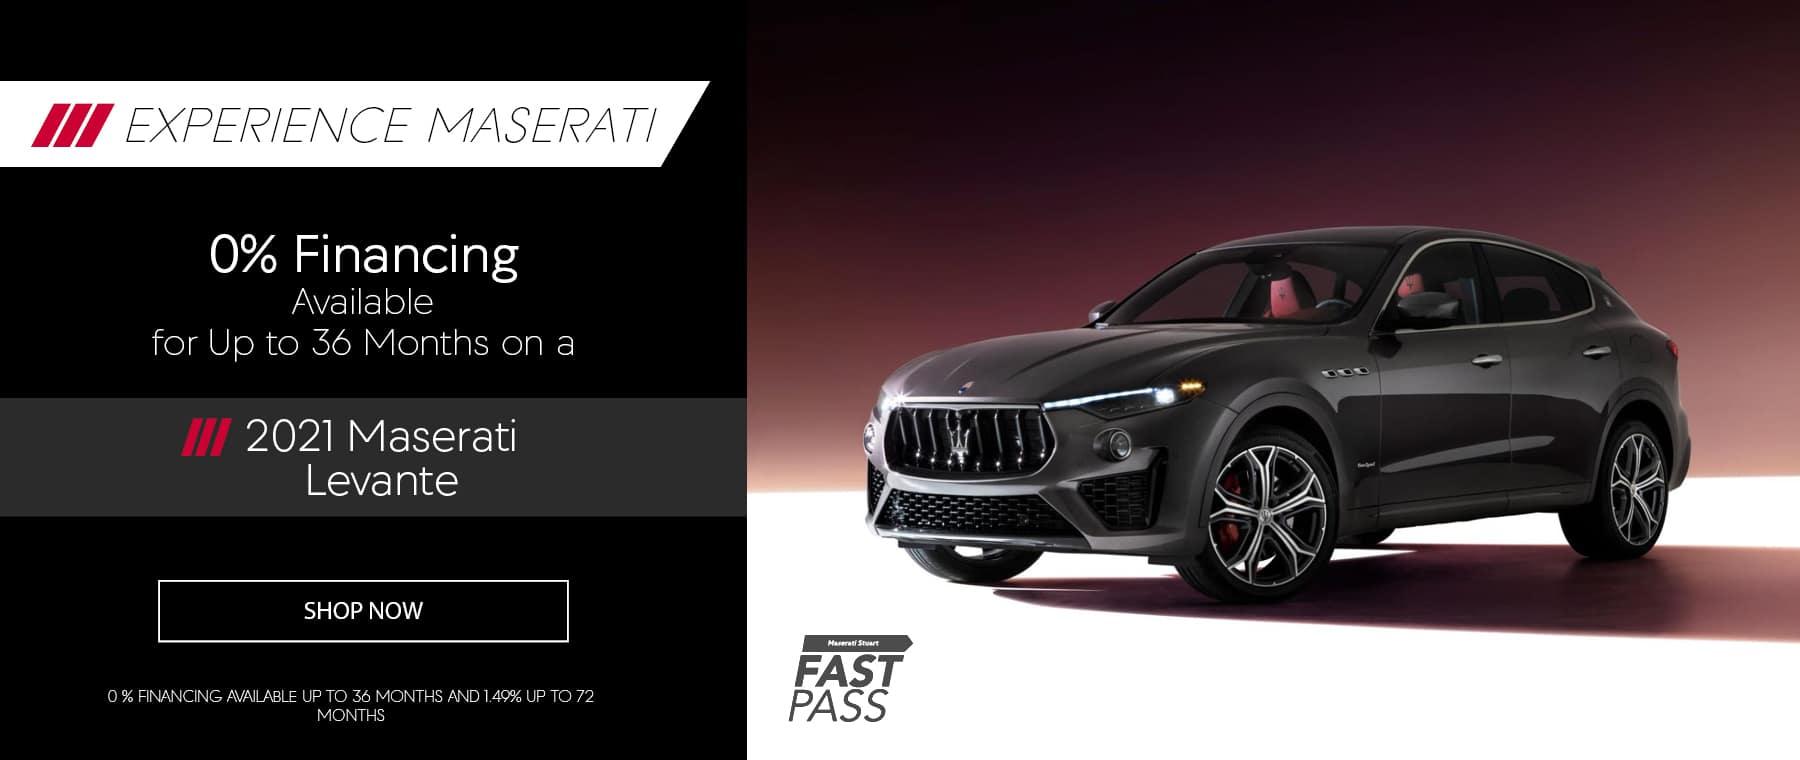 0 Fin_MaseratiStuart_ExperienceMaserti_WB_Mar2021 200794